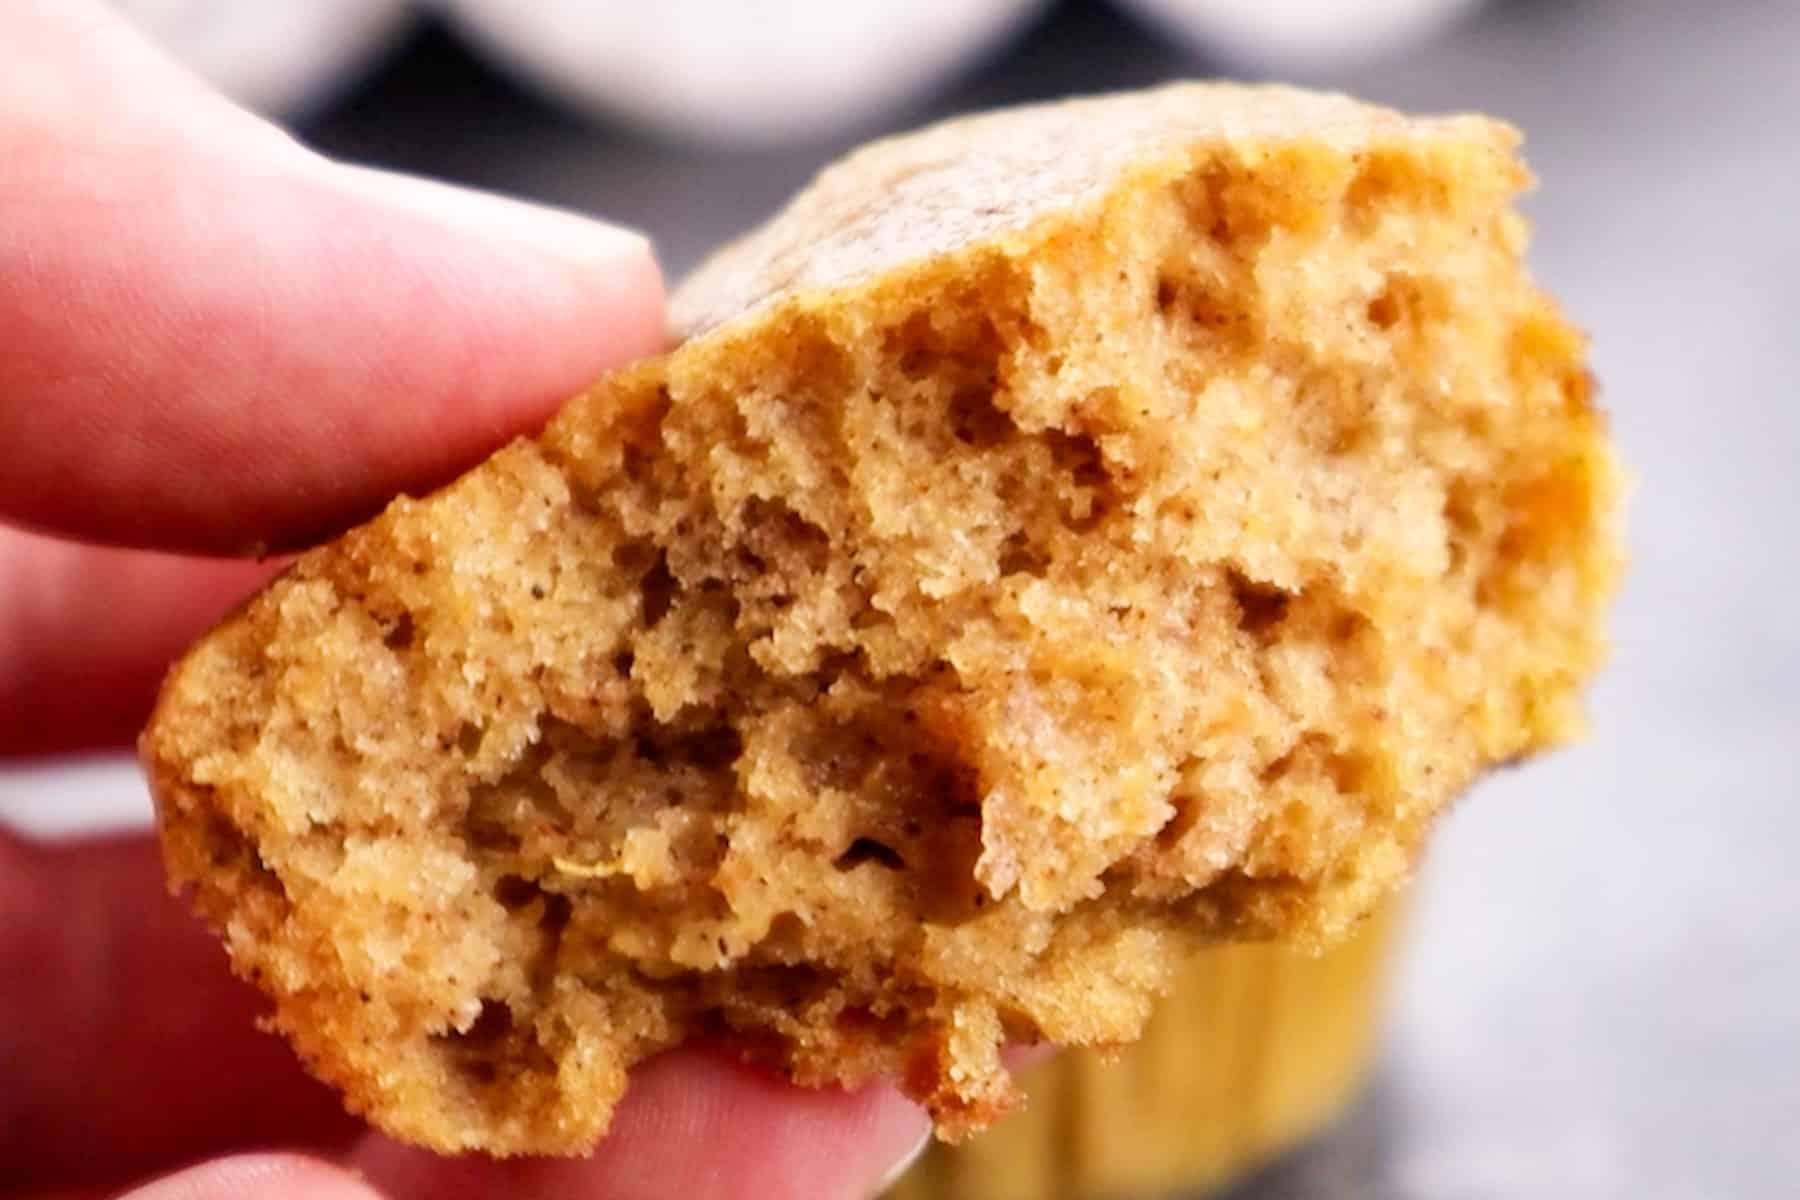 baked cupcake cut in half